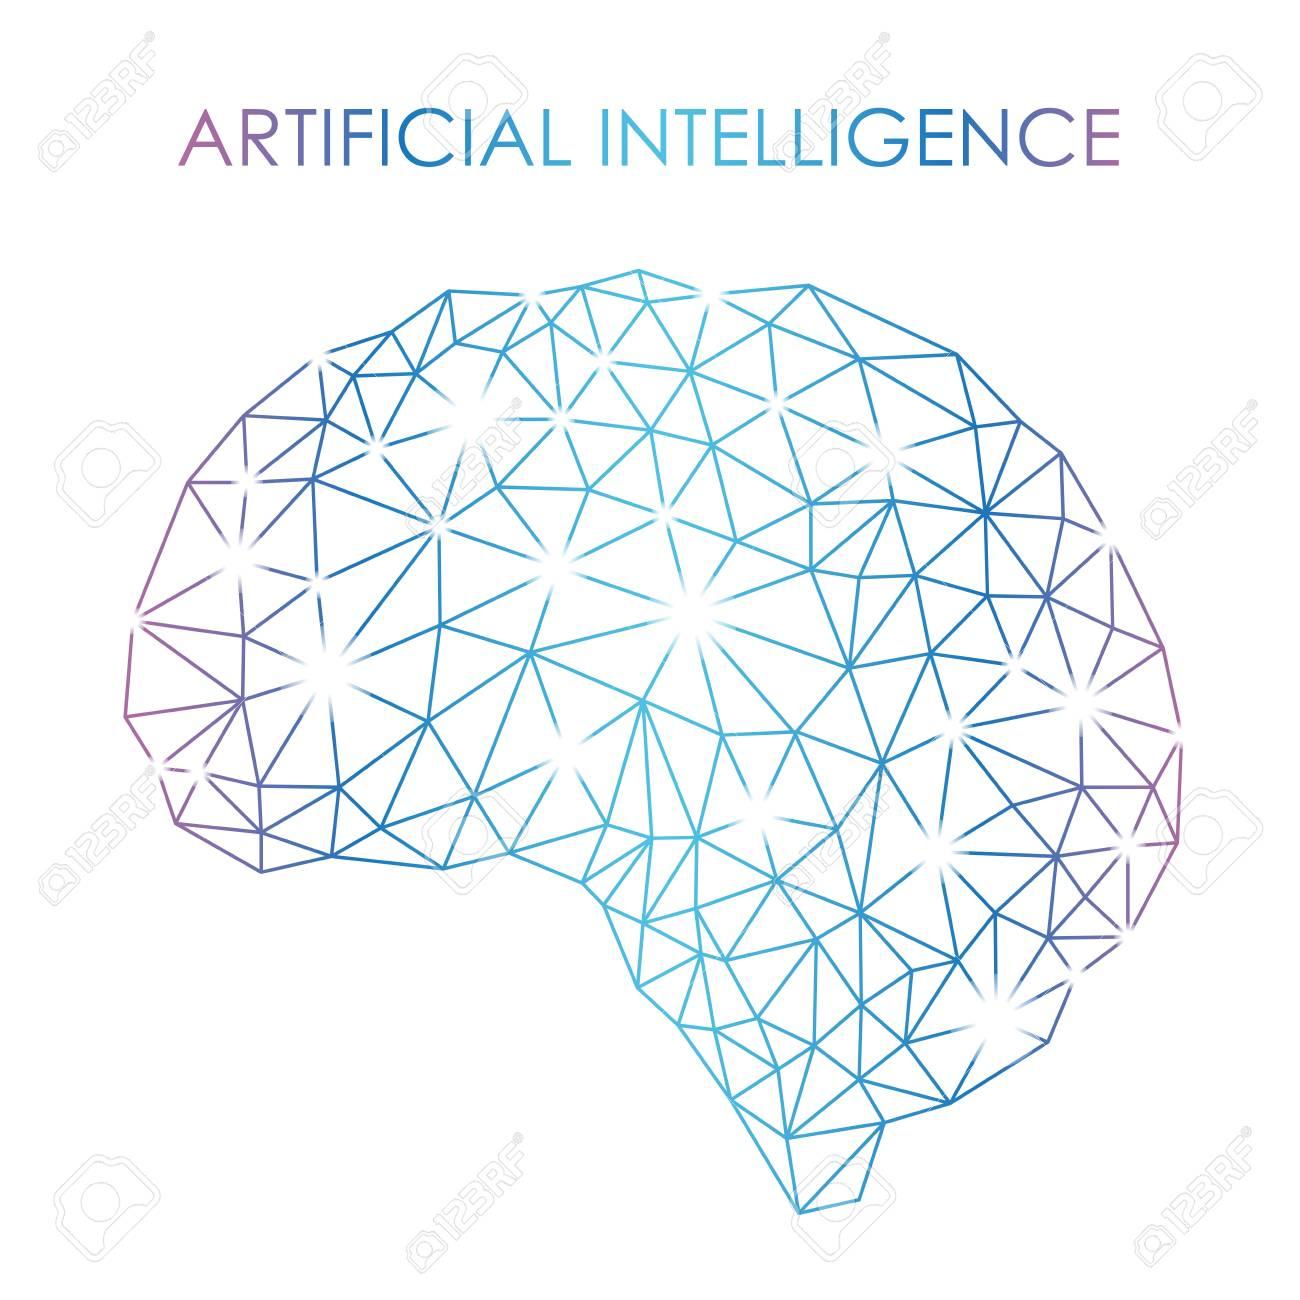 Artificial Intelligence concept, vector illustration. - 95536105